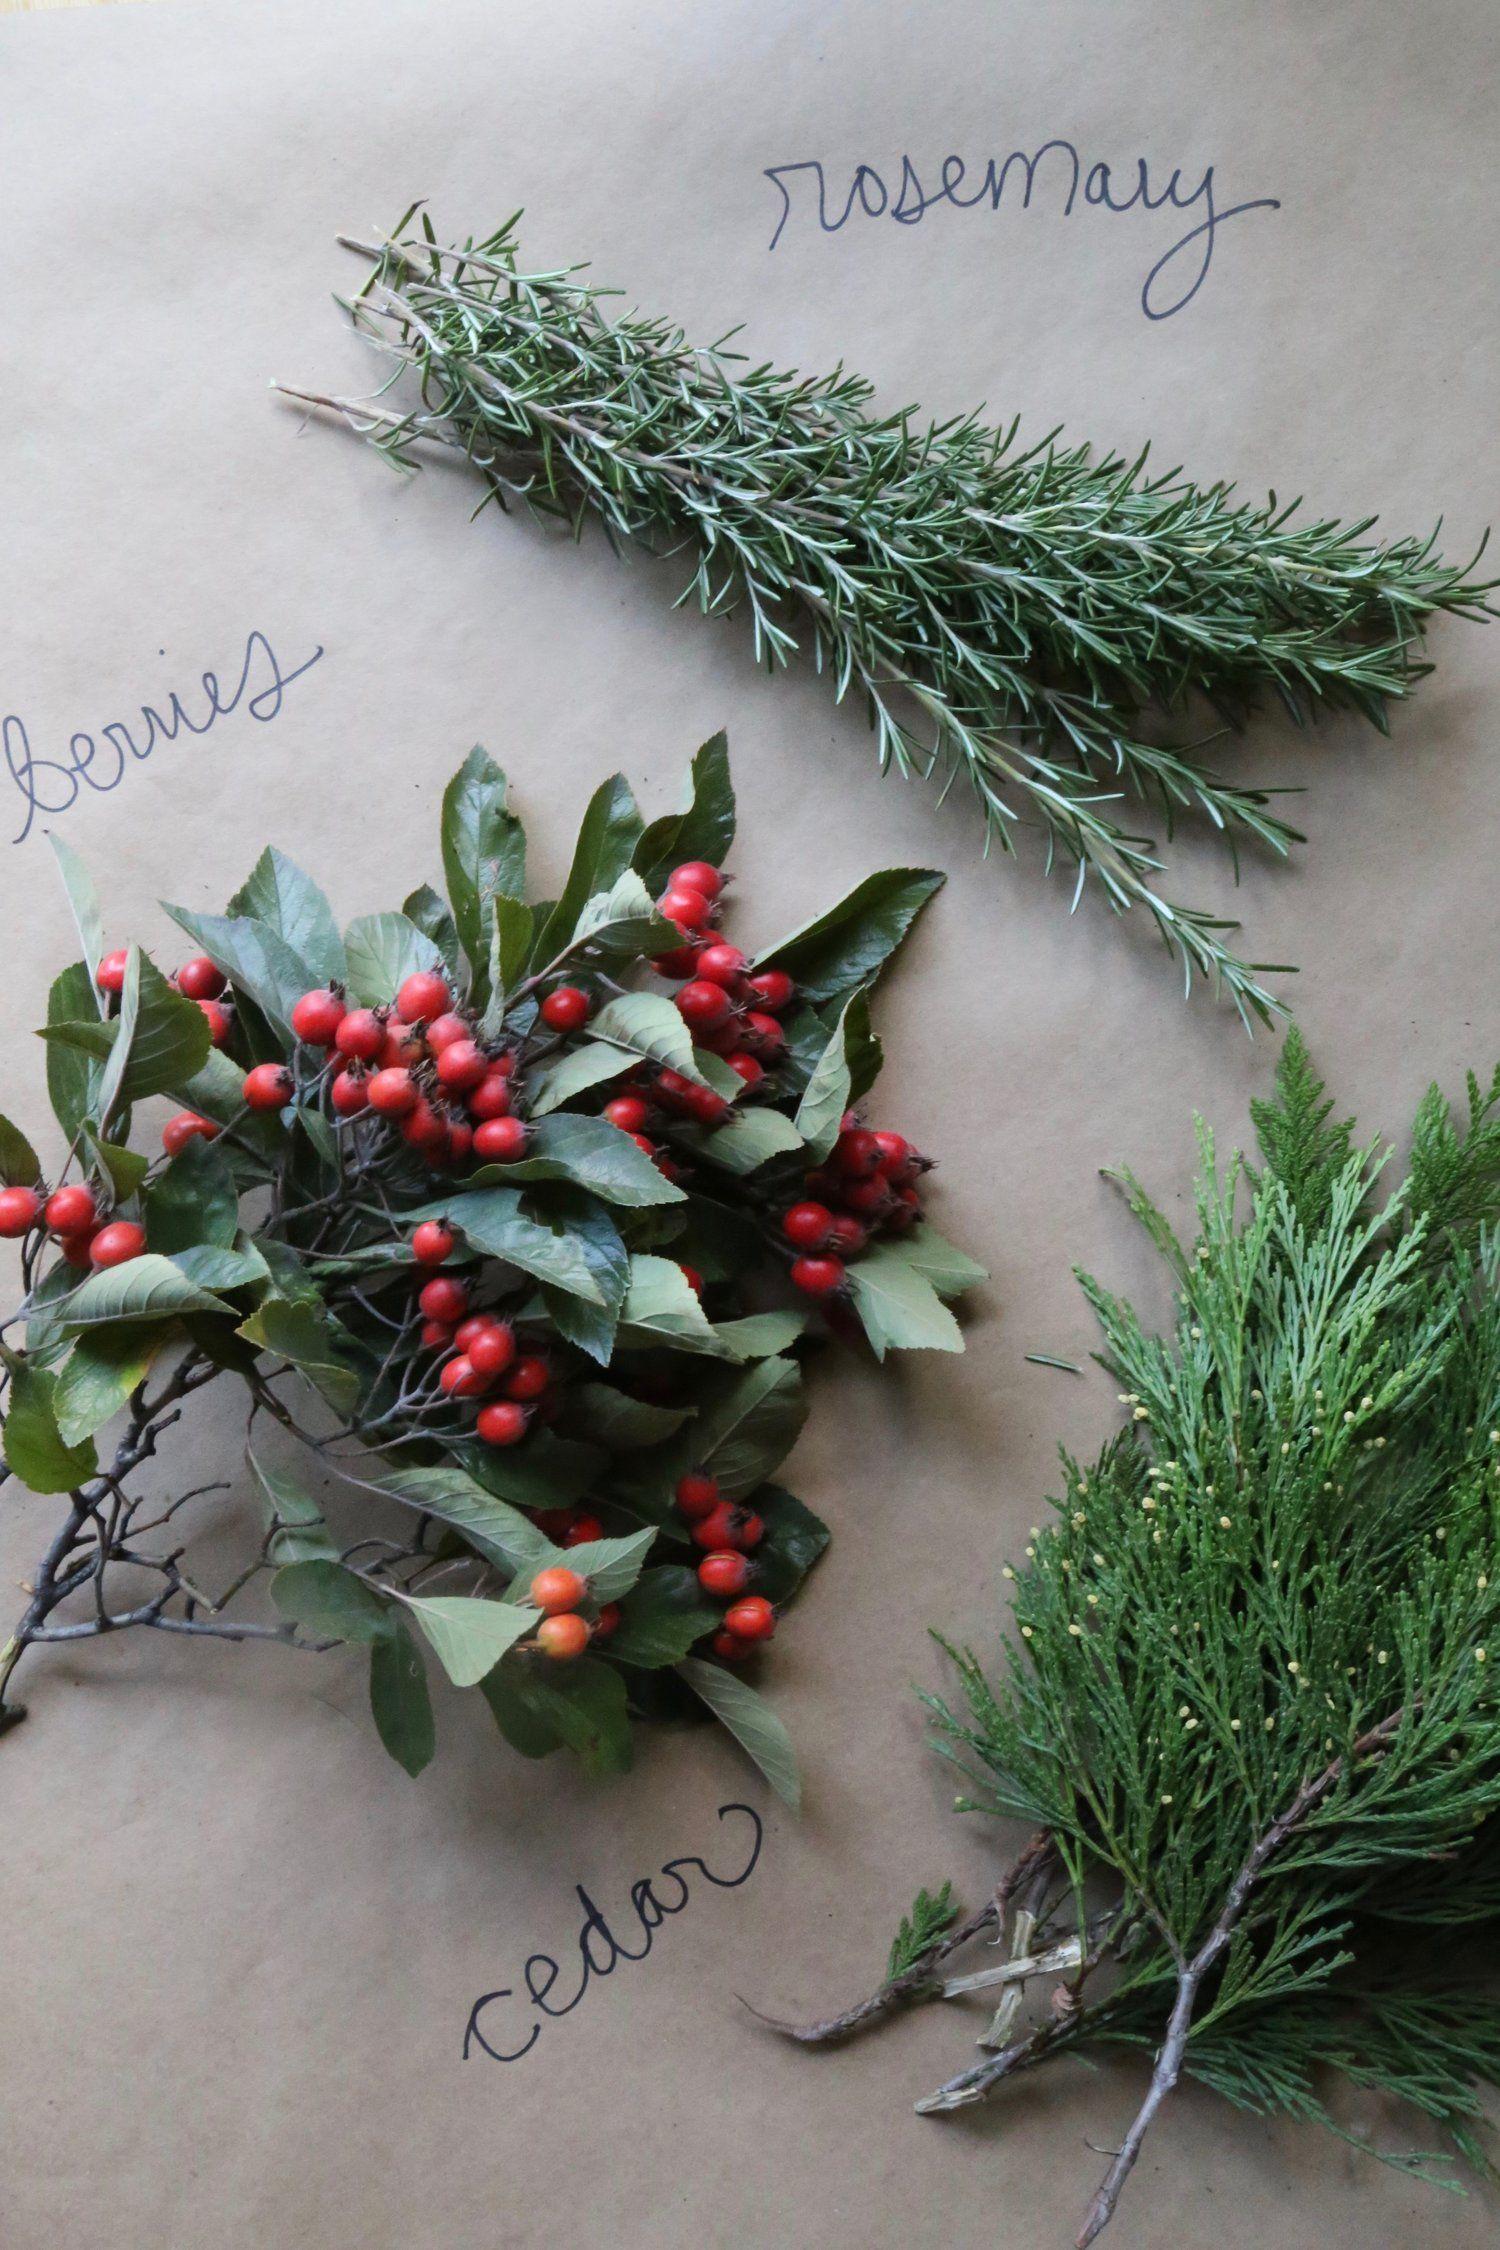 How to make a city foraged wreath